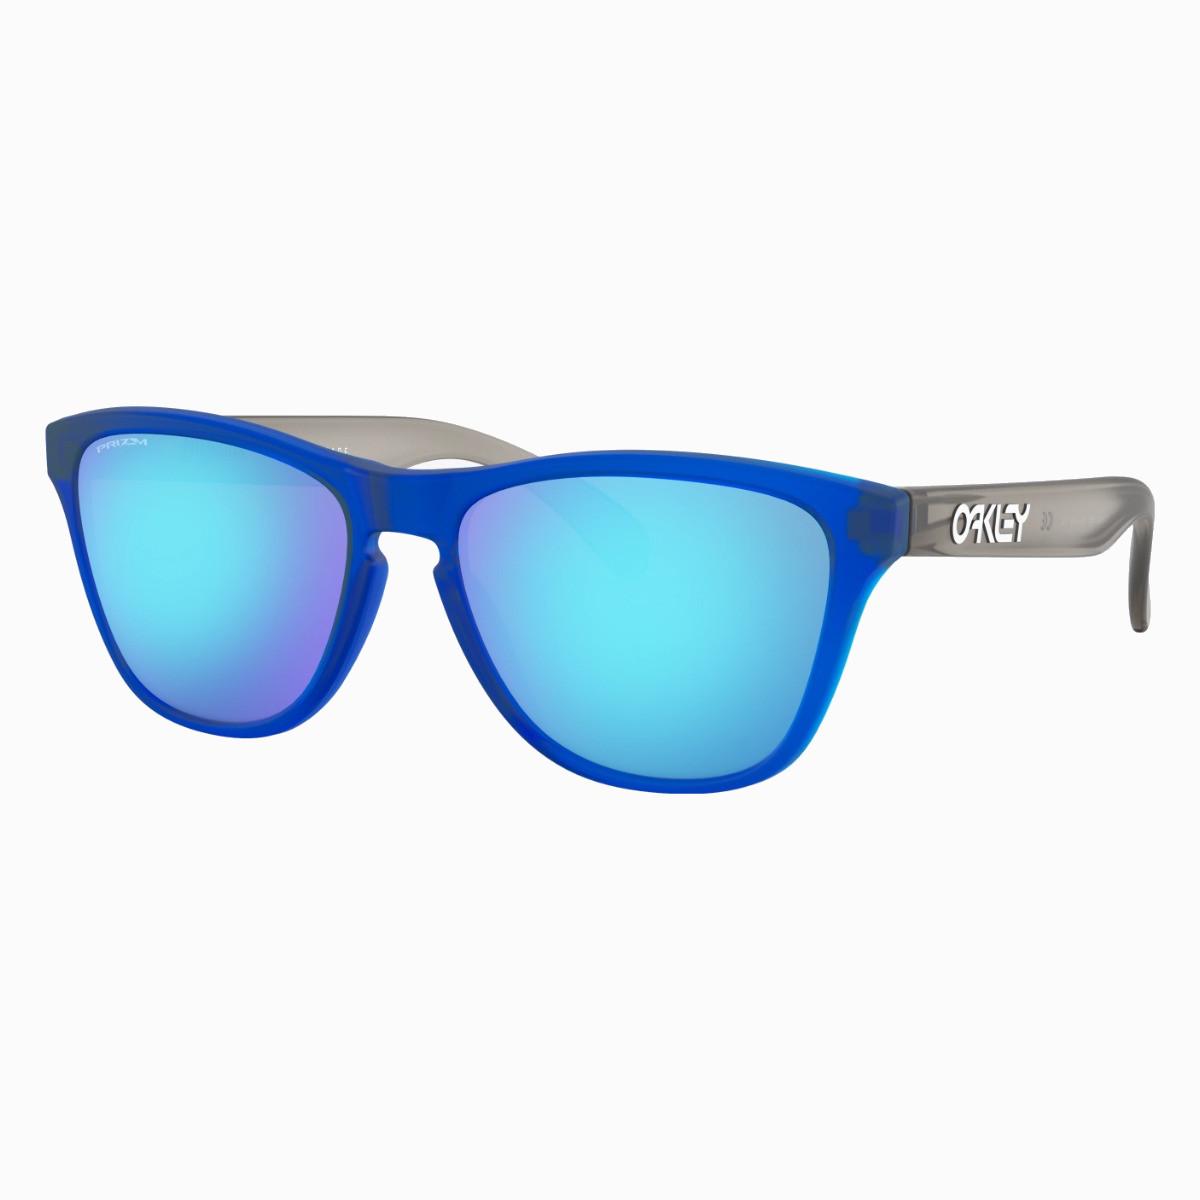 Óculos Oakley Frogskins Xs Matte Translucid Prizm Saphire